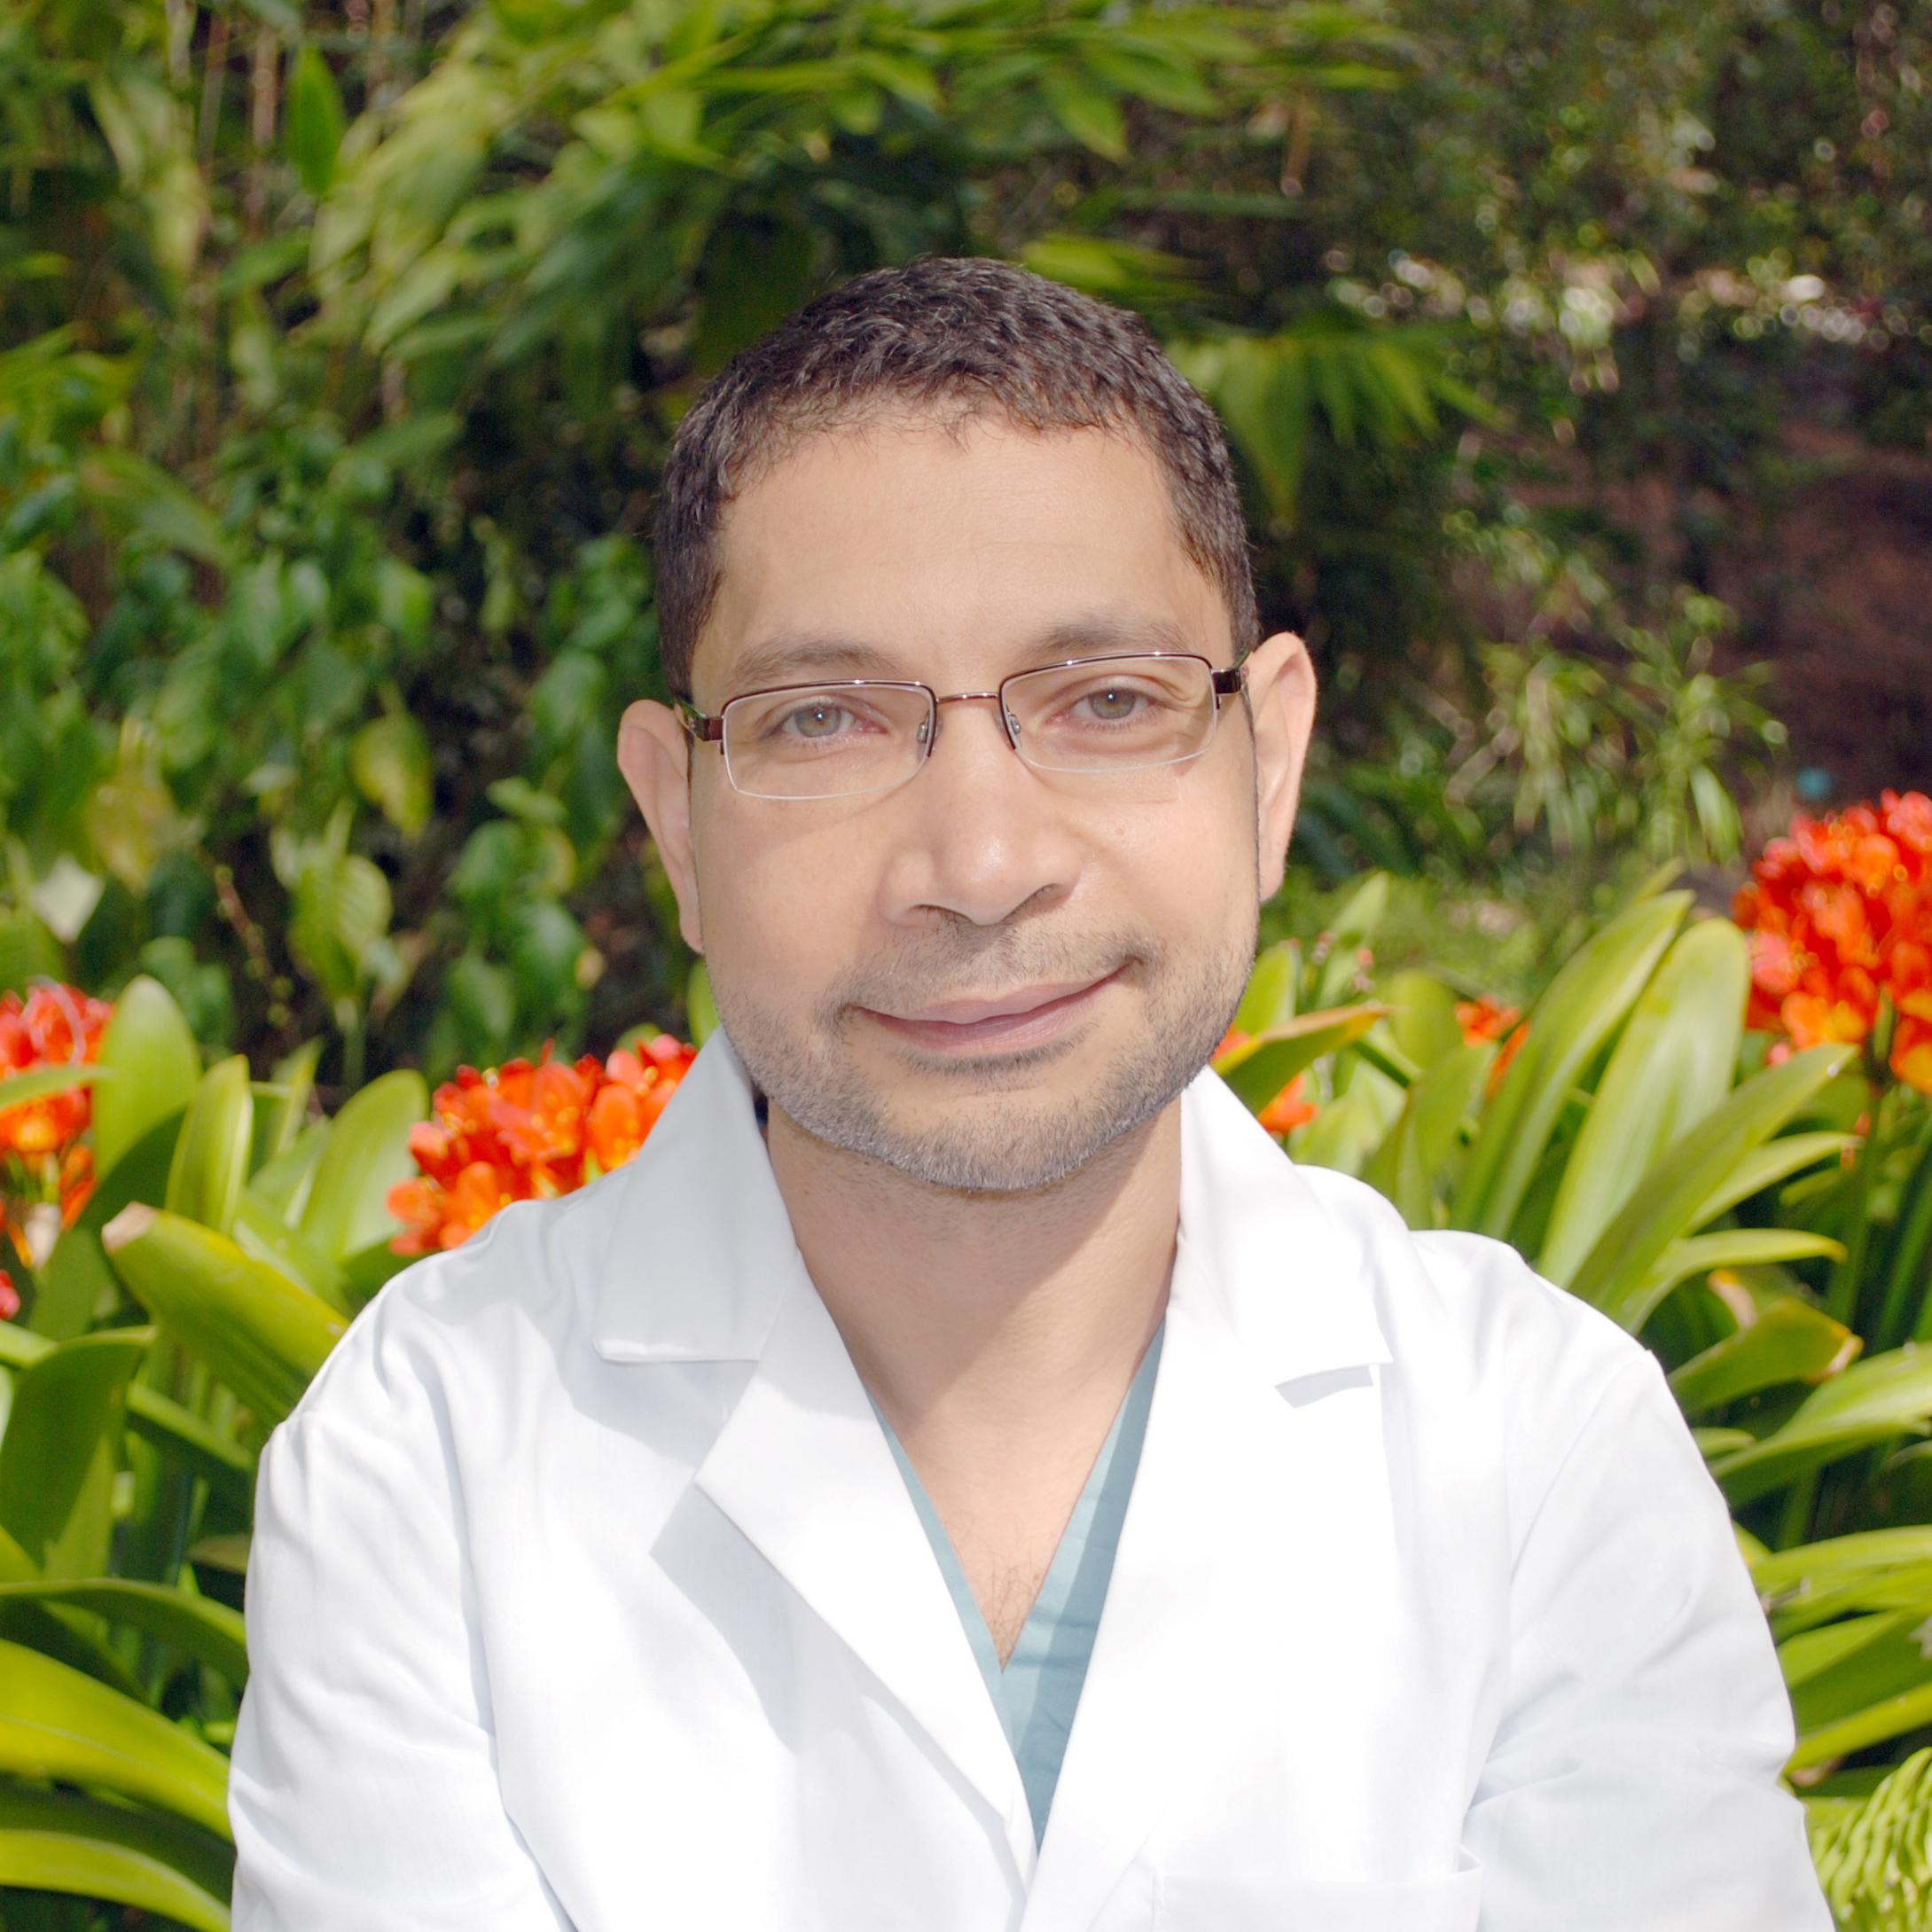 Moustafa El-Ghareeb, BDS, MS  Associate Clinical Professor